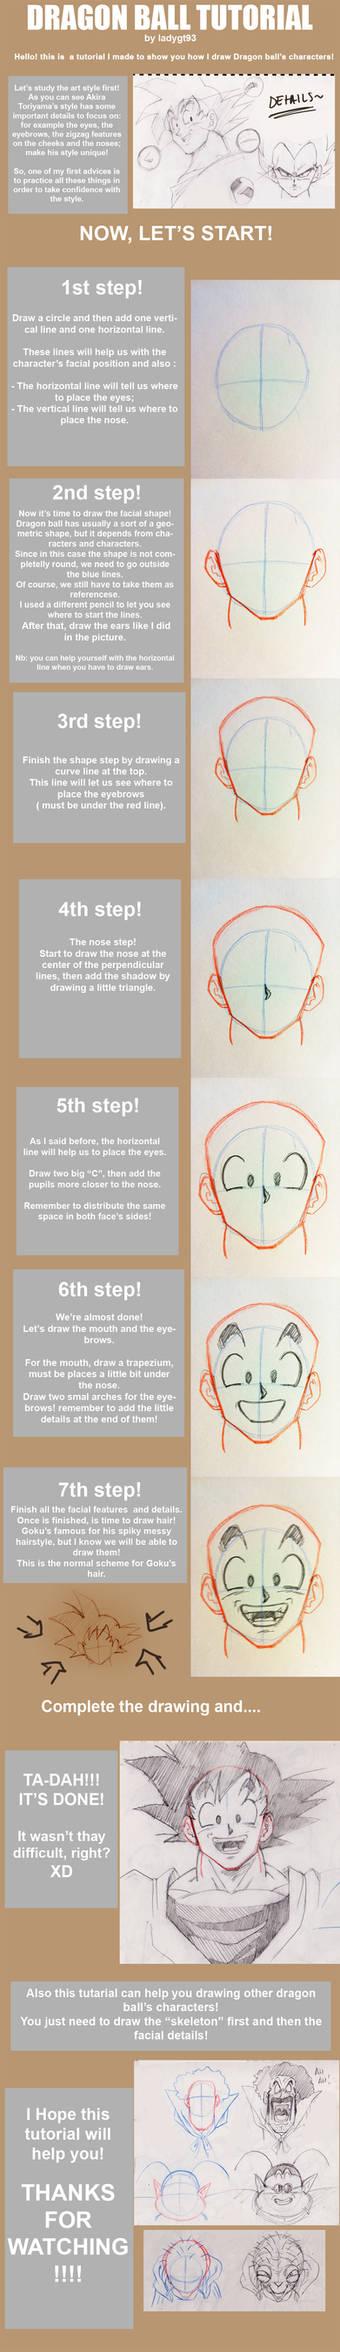 Dragon ball tutorial